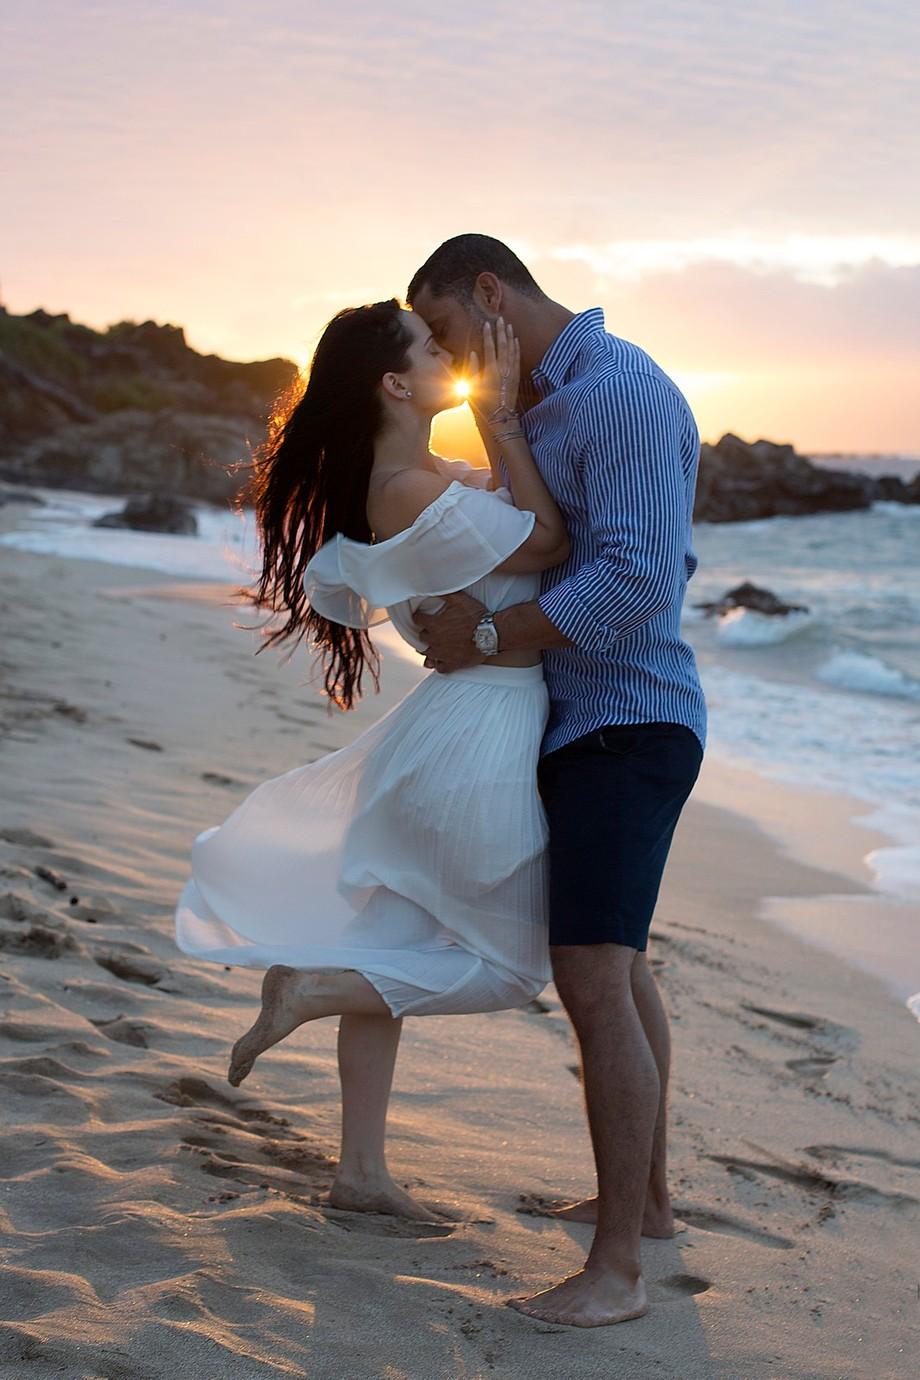 Sun Kiss by Stu_Soley - Love Photo Contest 2019